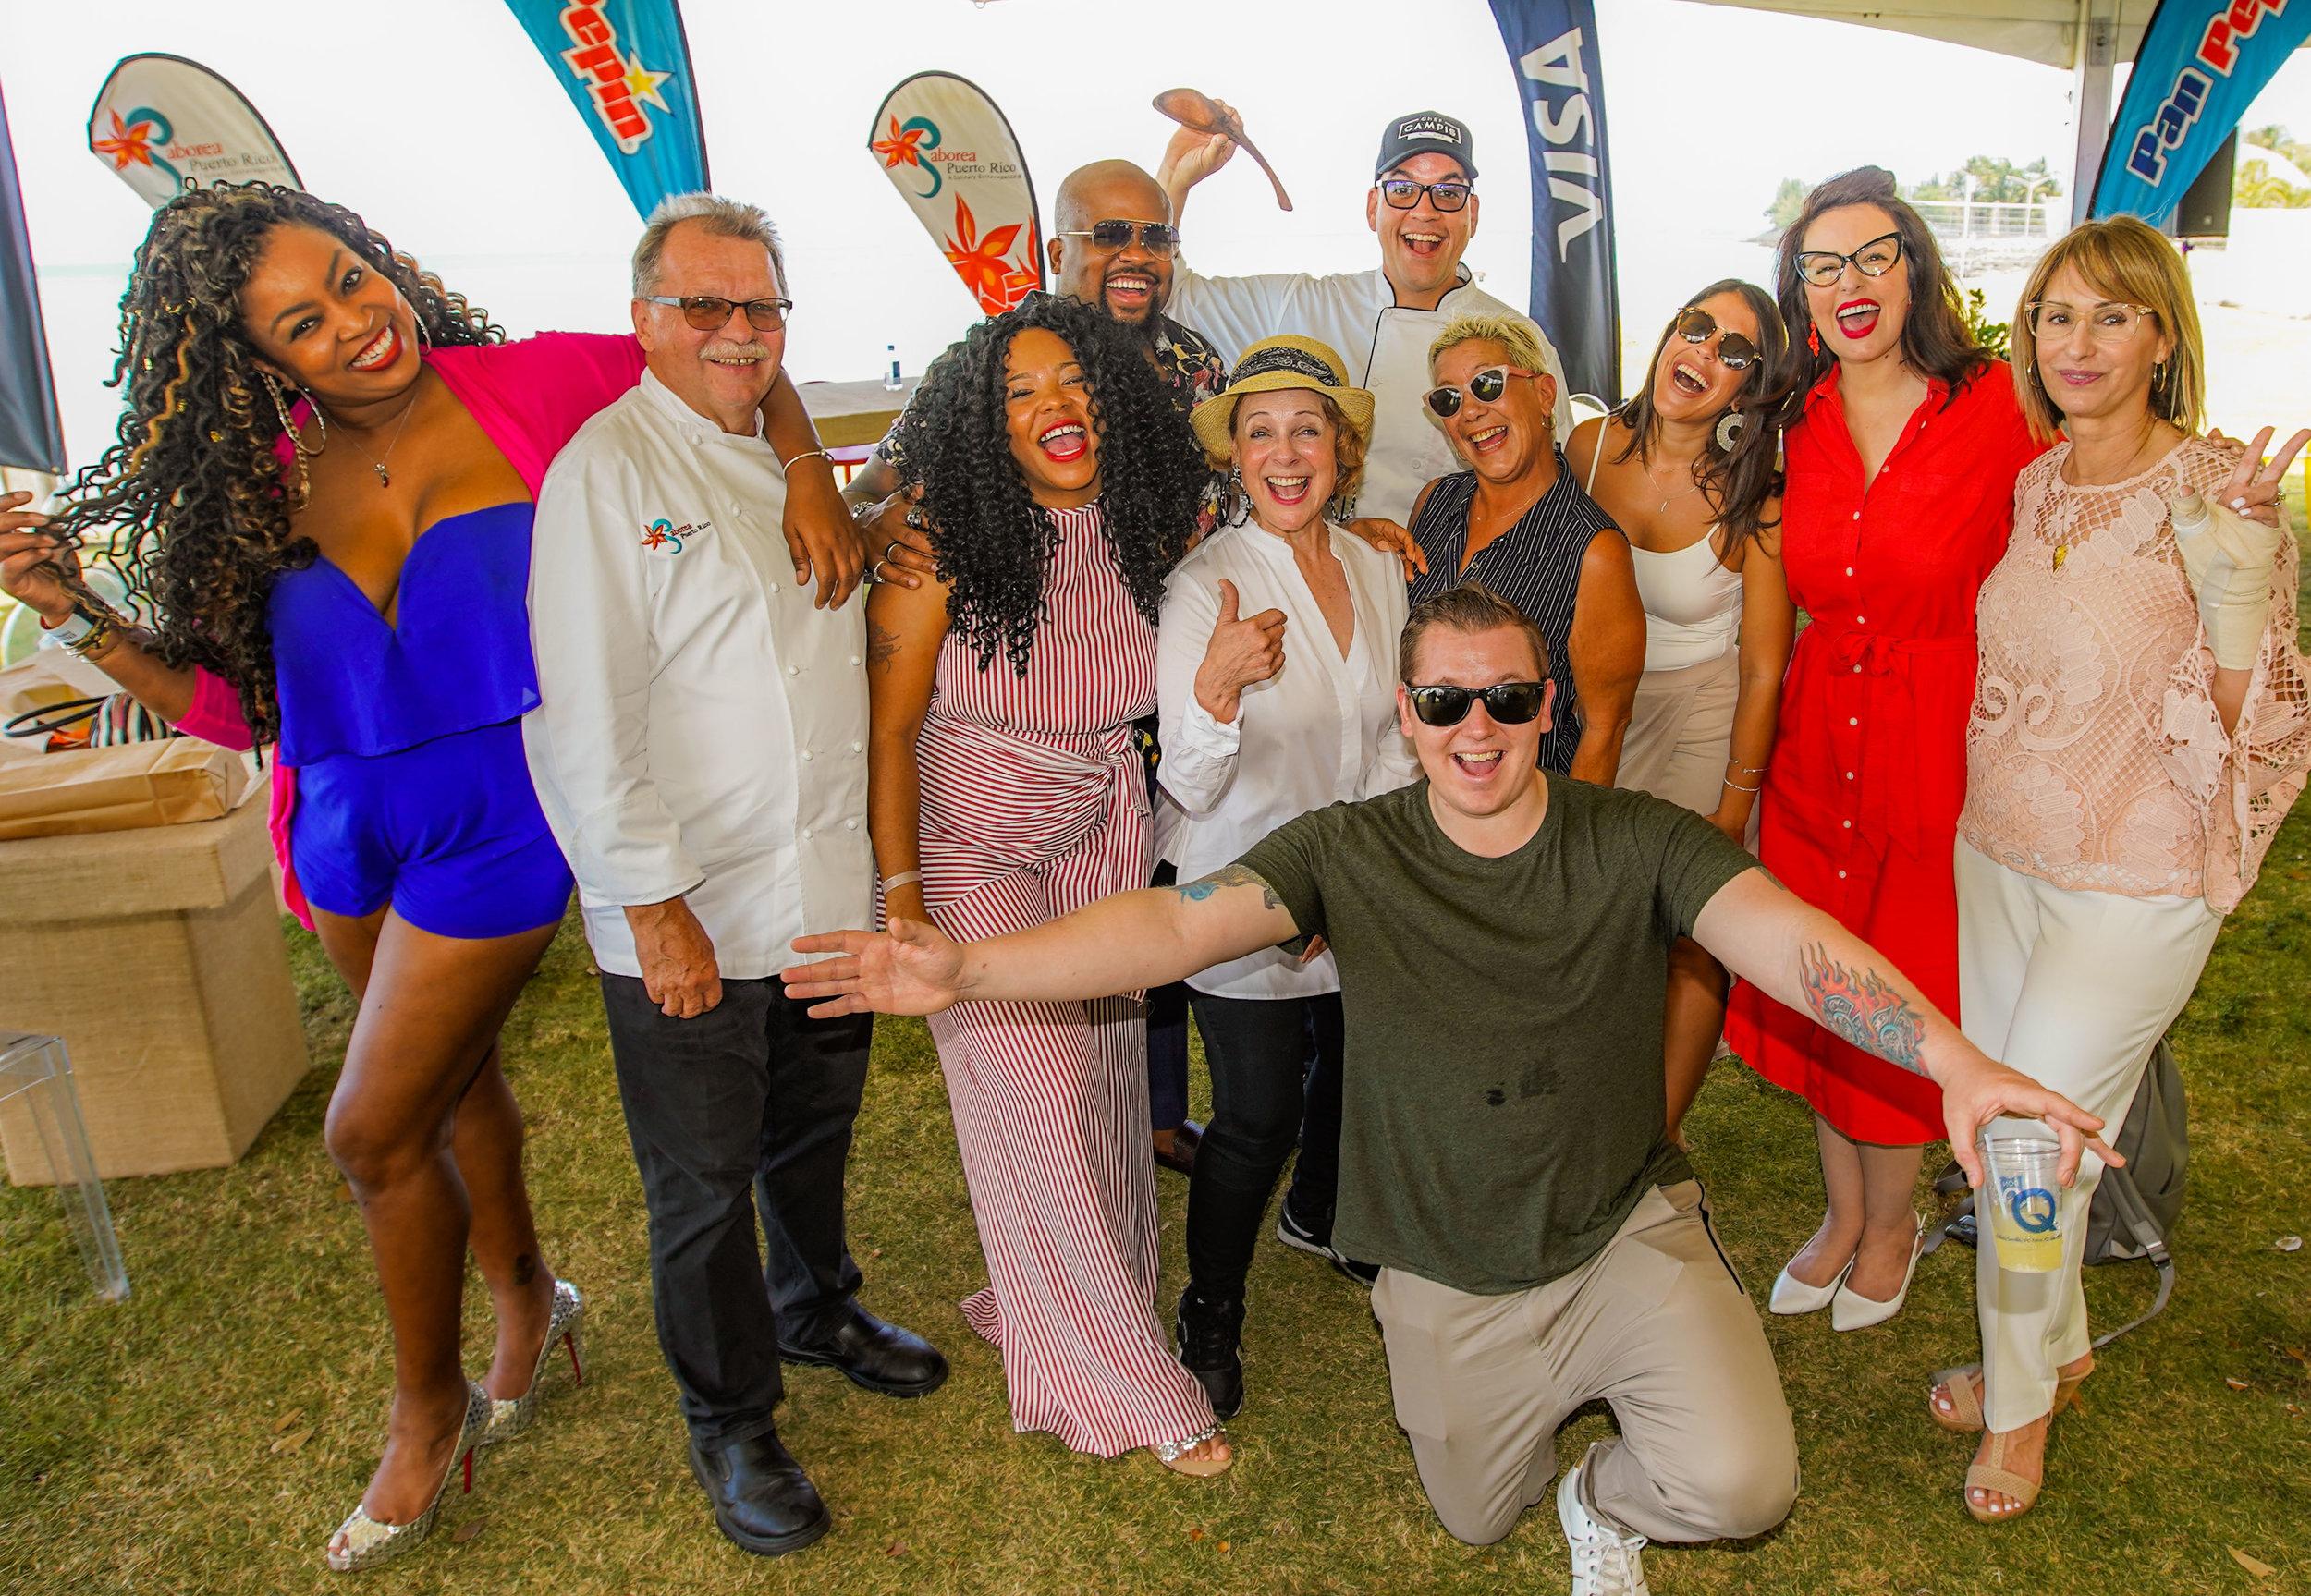 Joe Colon Studio, Inc. All Rights Reserved. 2019 / Celebridades a presentarse en Saborea Puerto Rico 2019